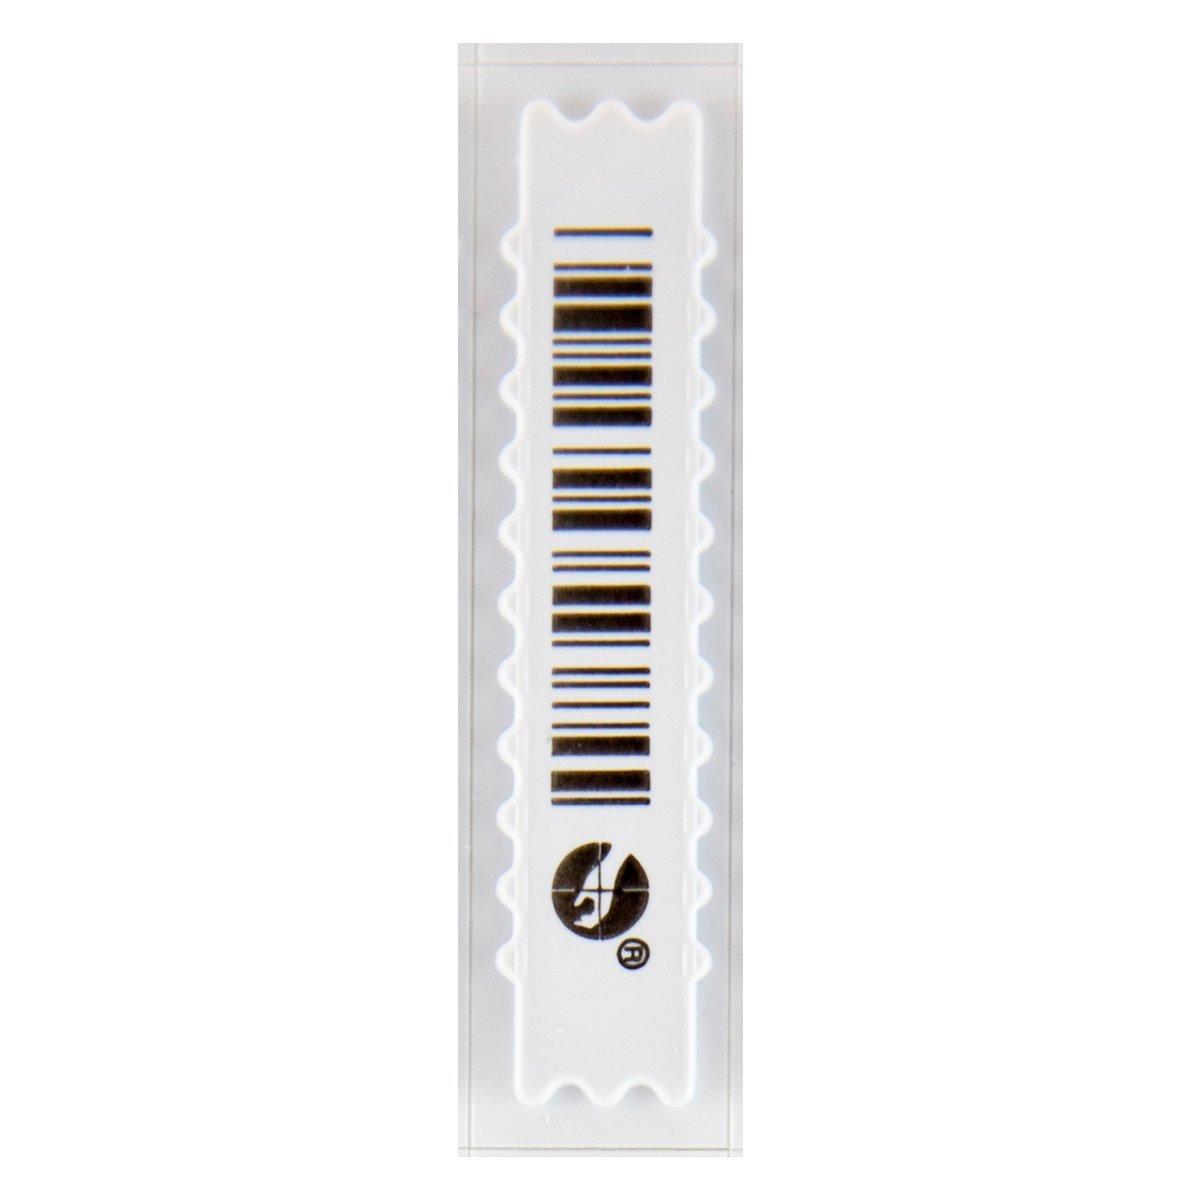 Sensormatic APX Mock Barcode Sheet Label Pack of 5000